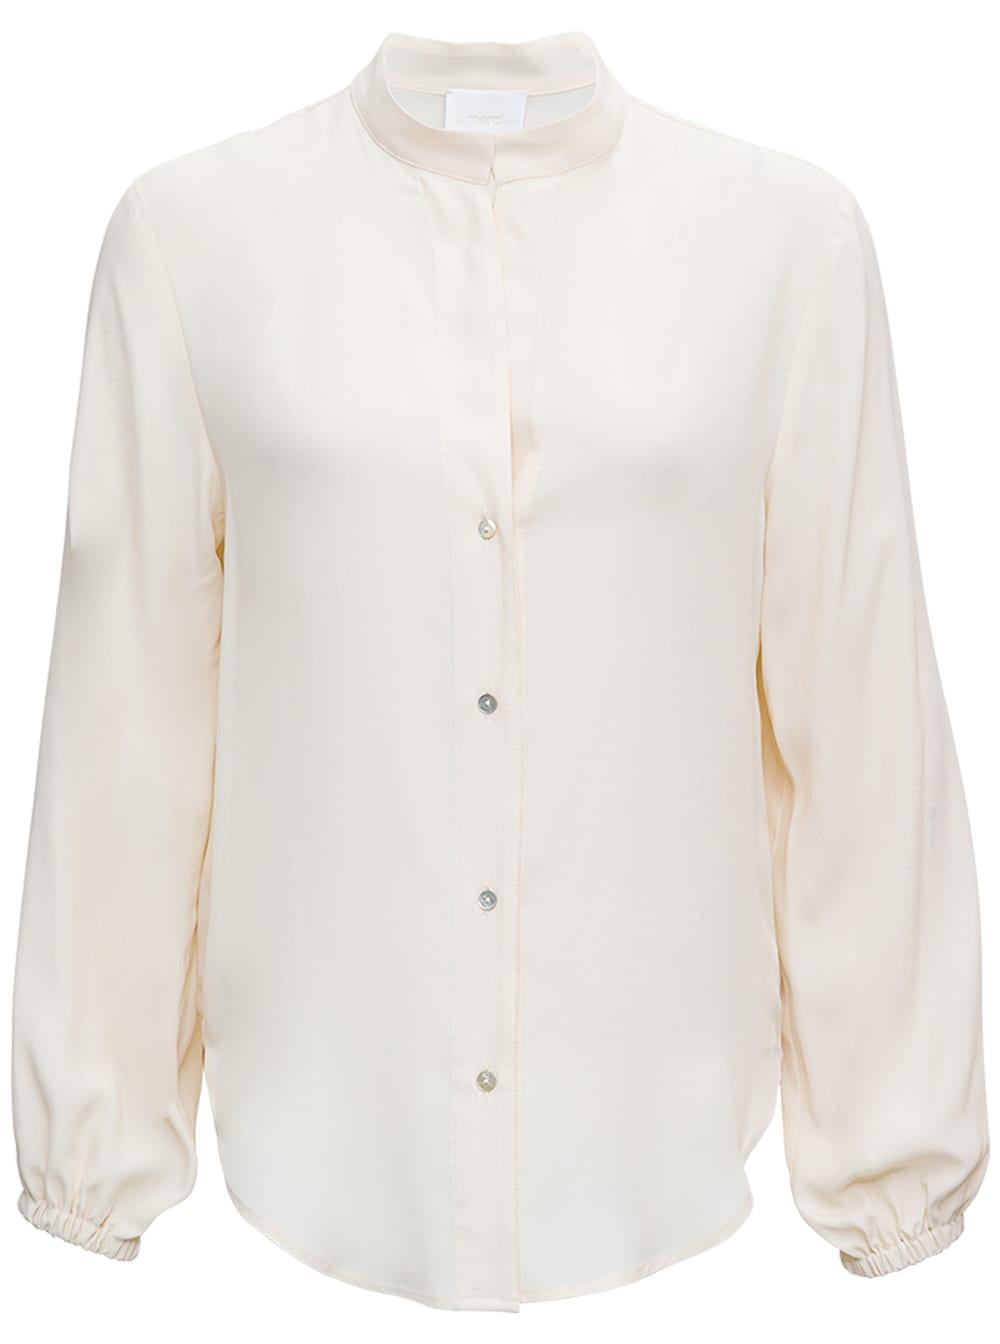 White Shirt With Mandarin Collar